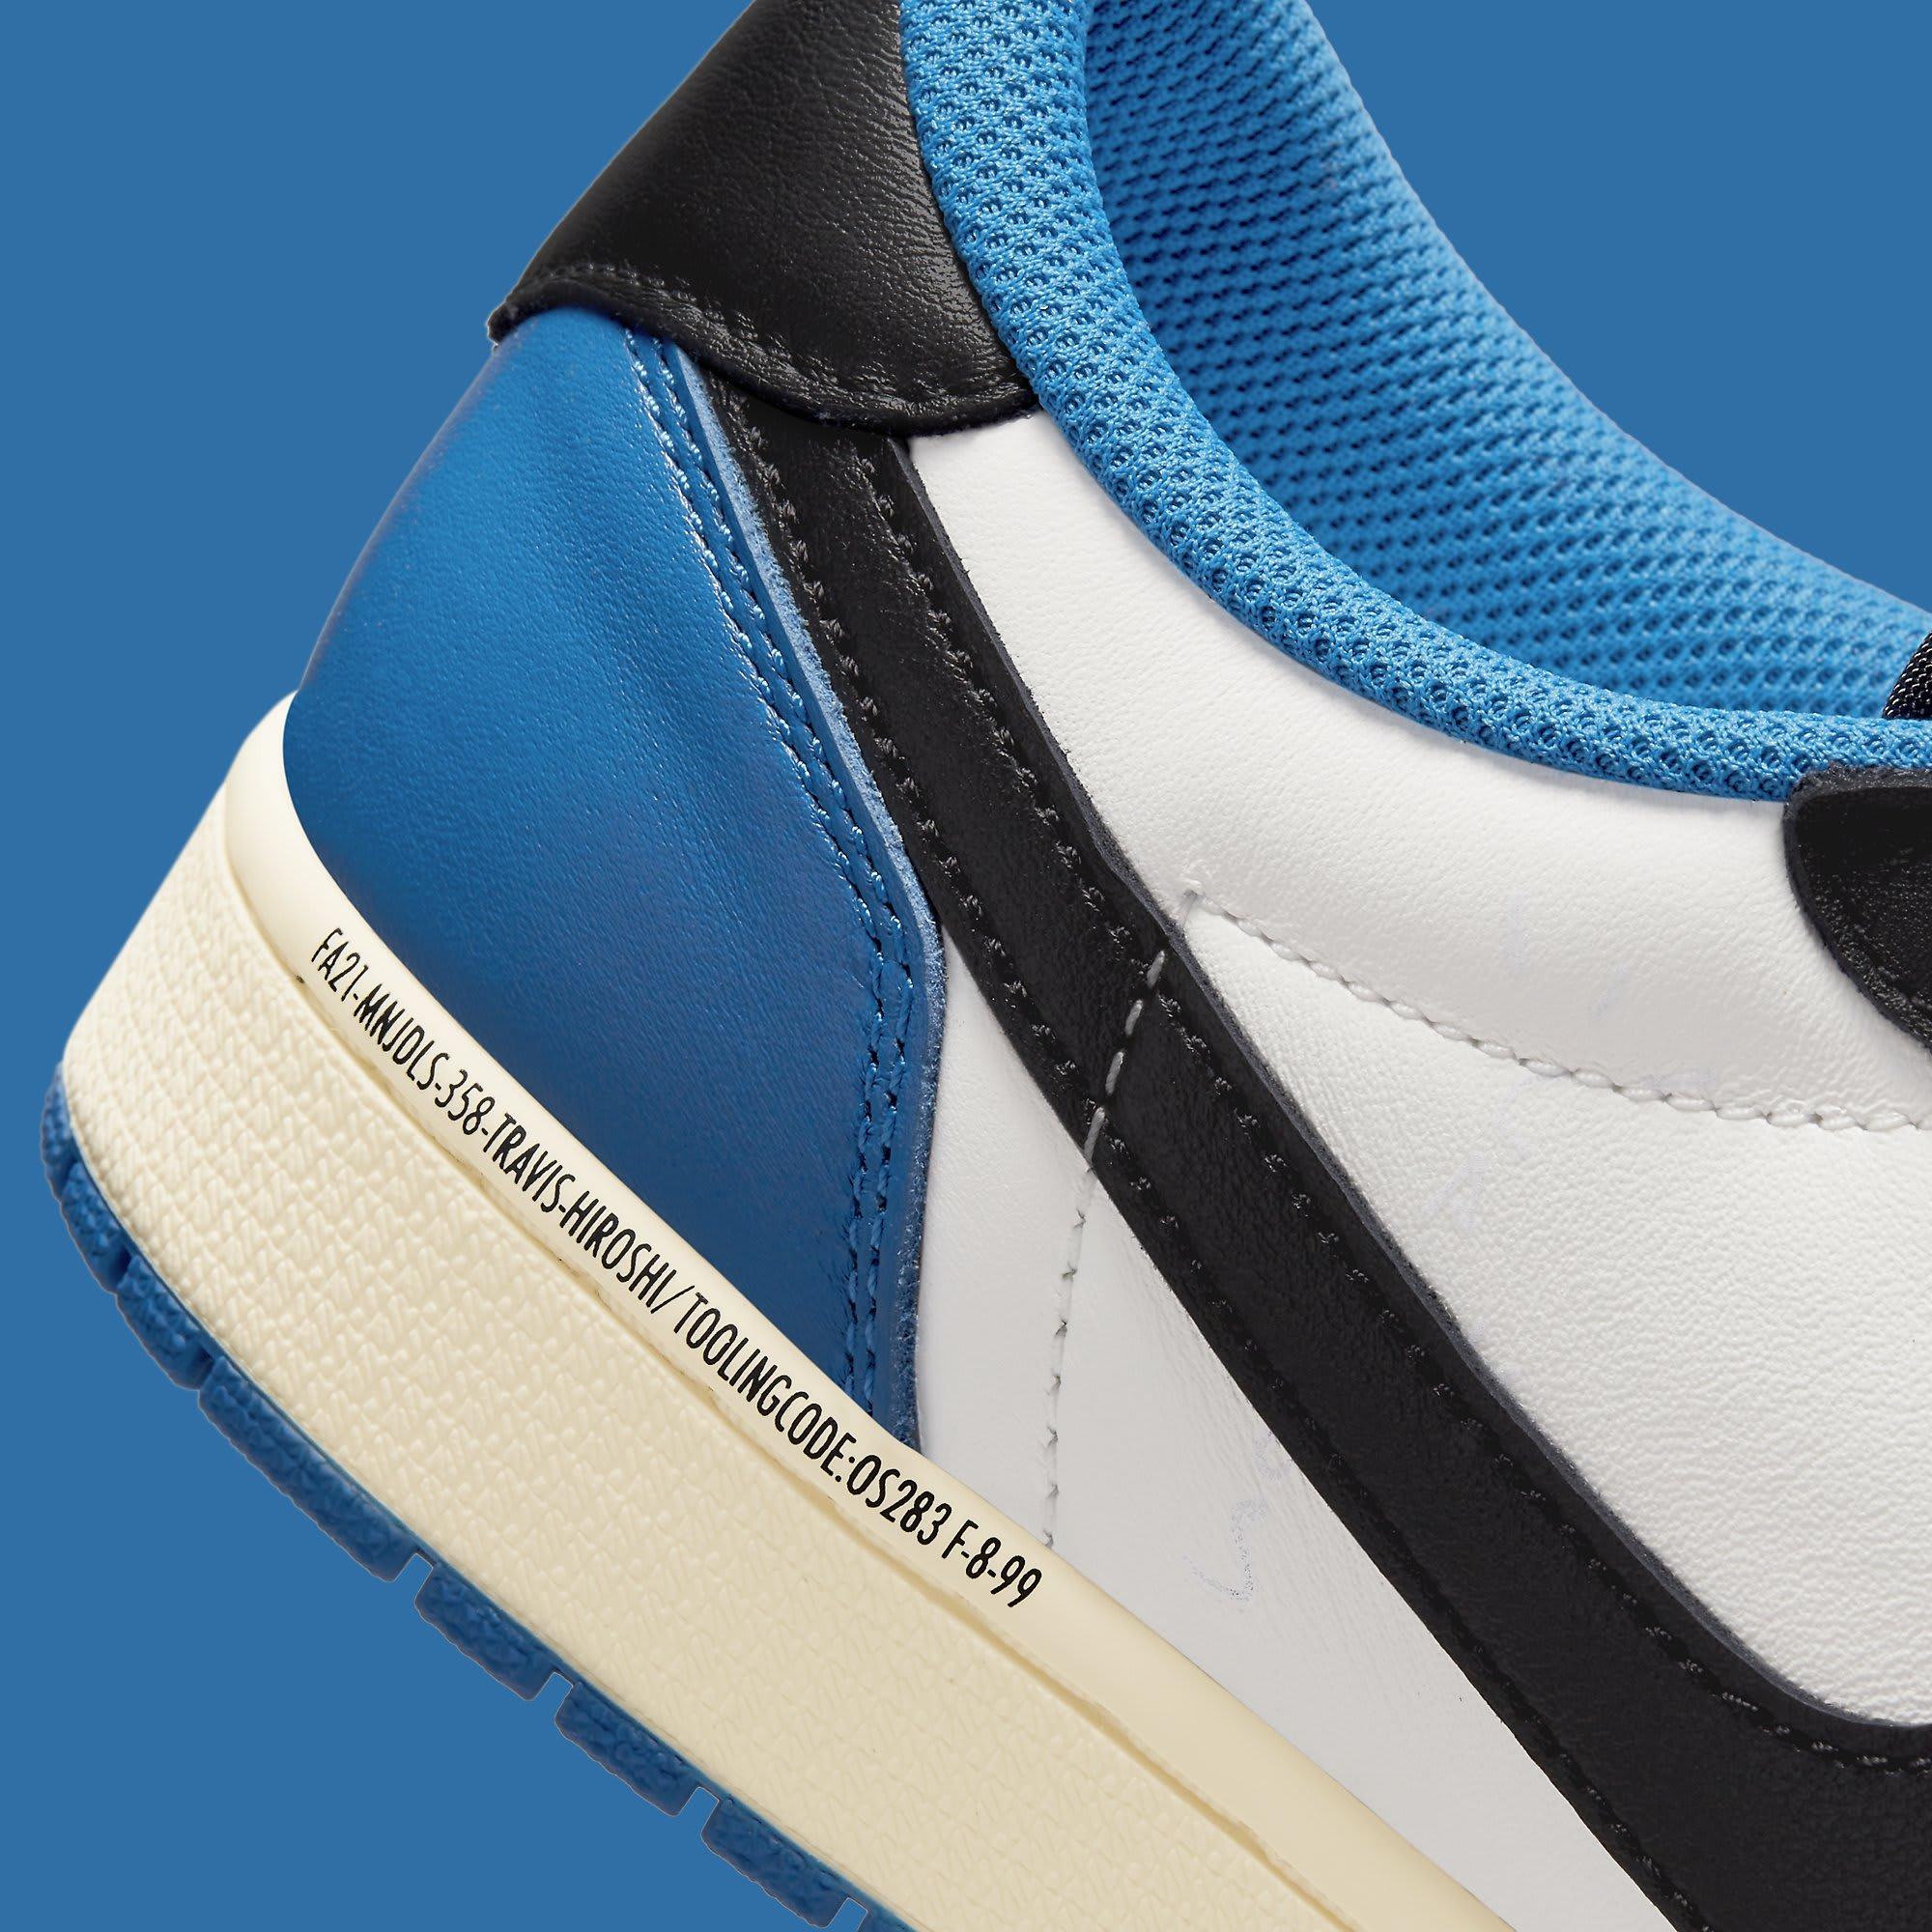 Travis Scott x Fragment x Air Jordan 1 Low Release Date DM7866-140 Medial Detail